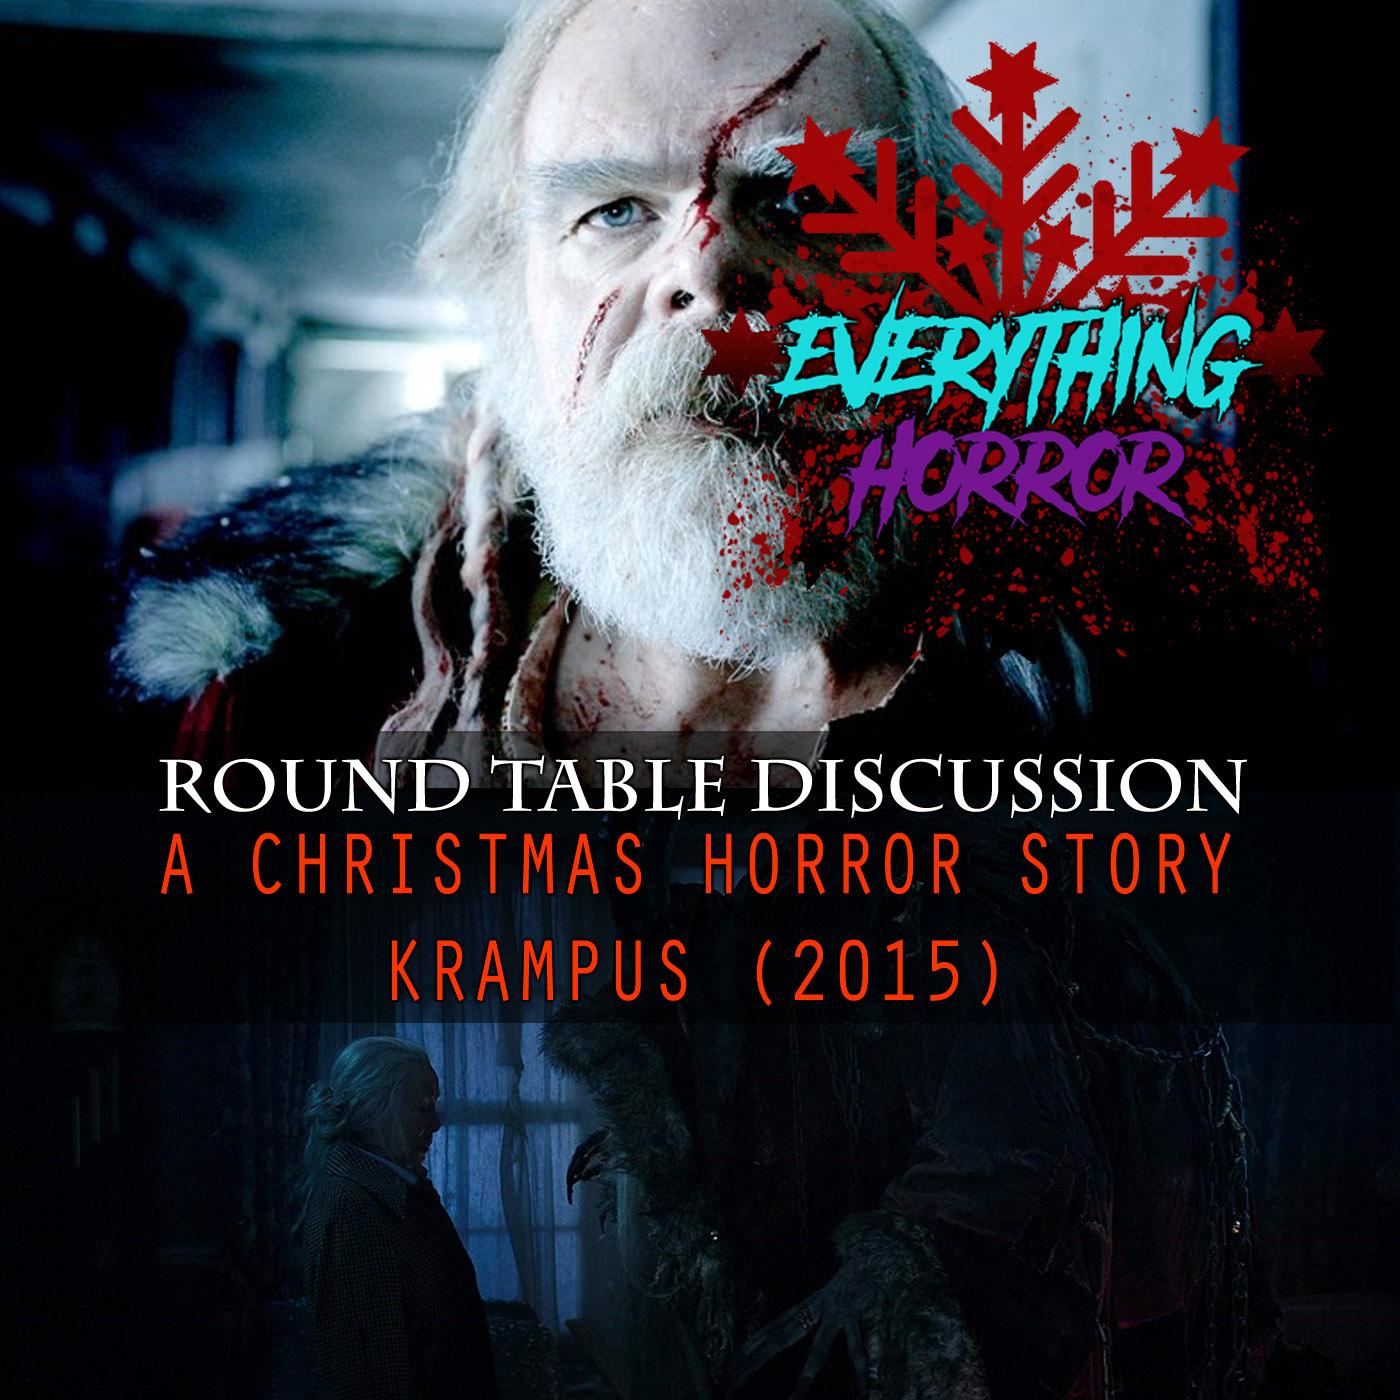 Christmas Horror Story Krampus.Special Christmas Round Table A Christmas Horror Story